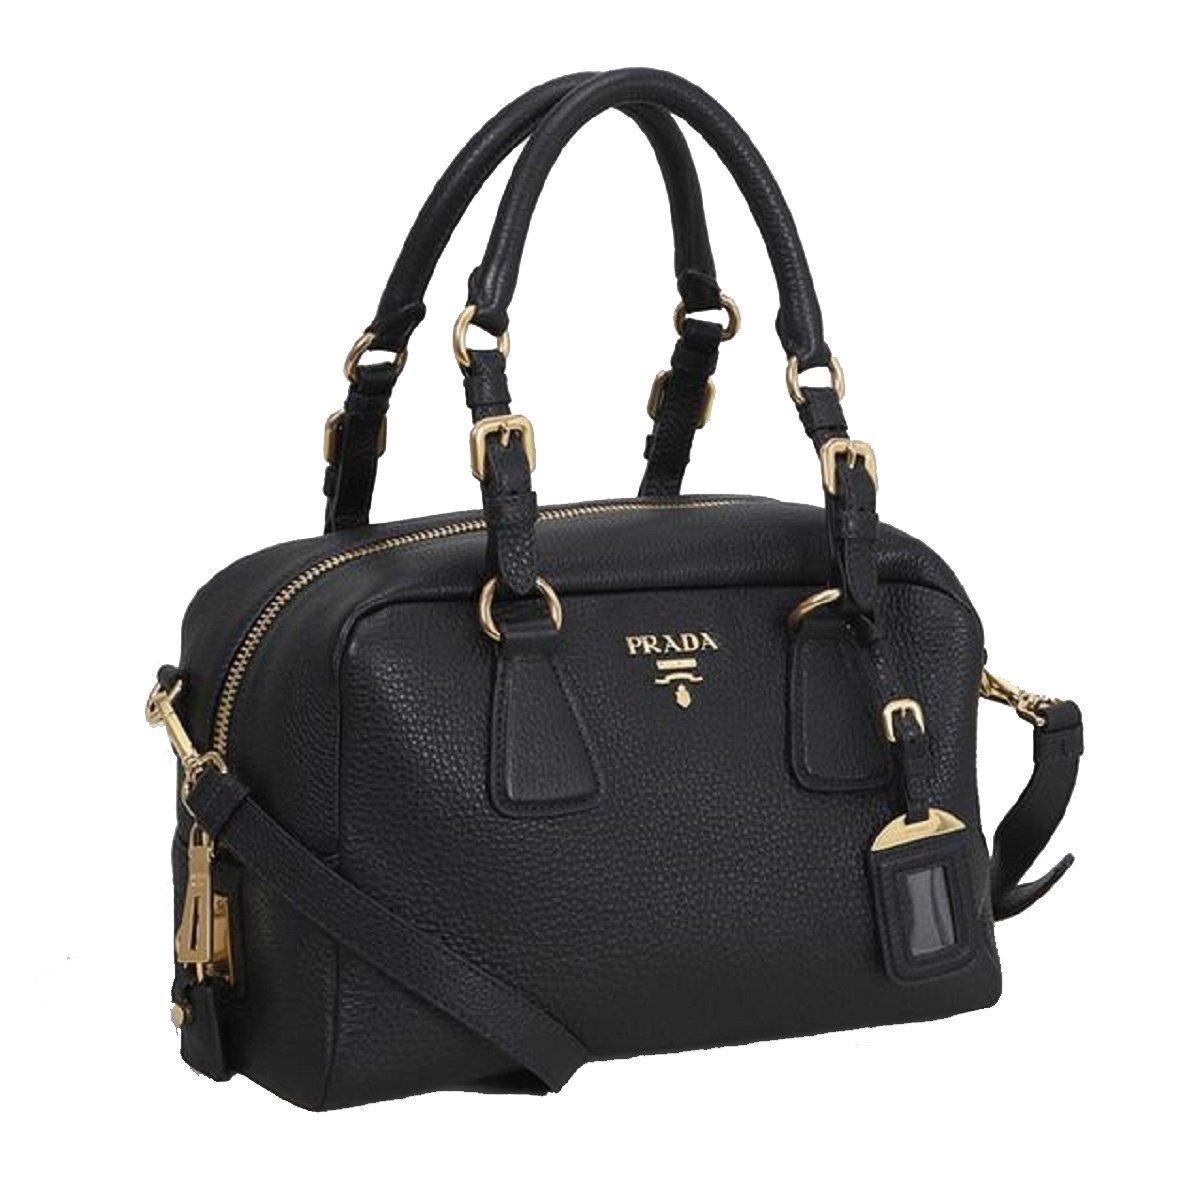 0a33a0be9b5d Prada 1BB091 Vitello Daino Nero Black Top Handle Bag Convertible Shoulder  Bag Satchel 0